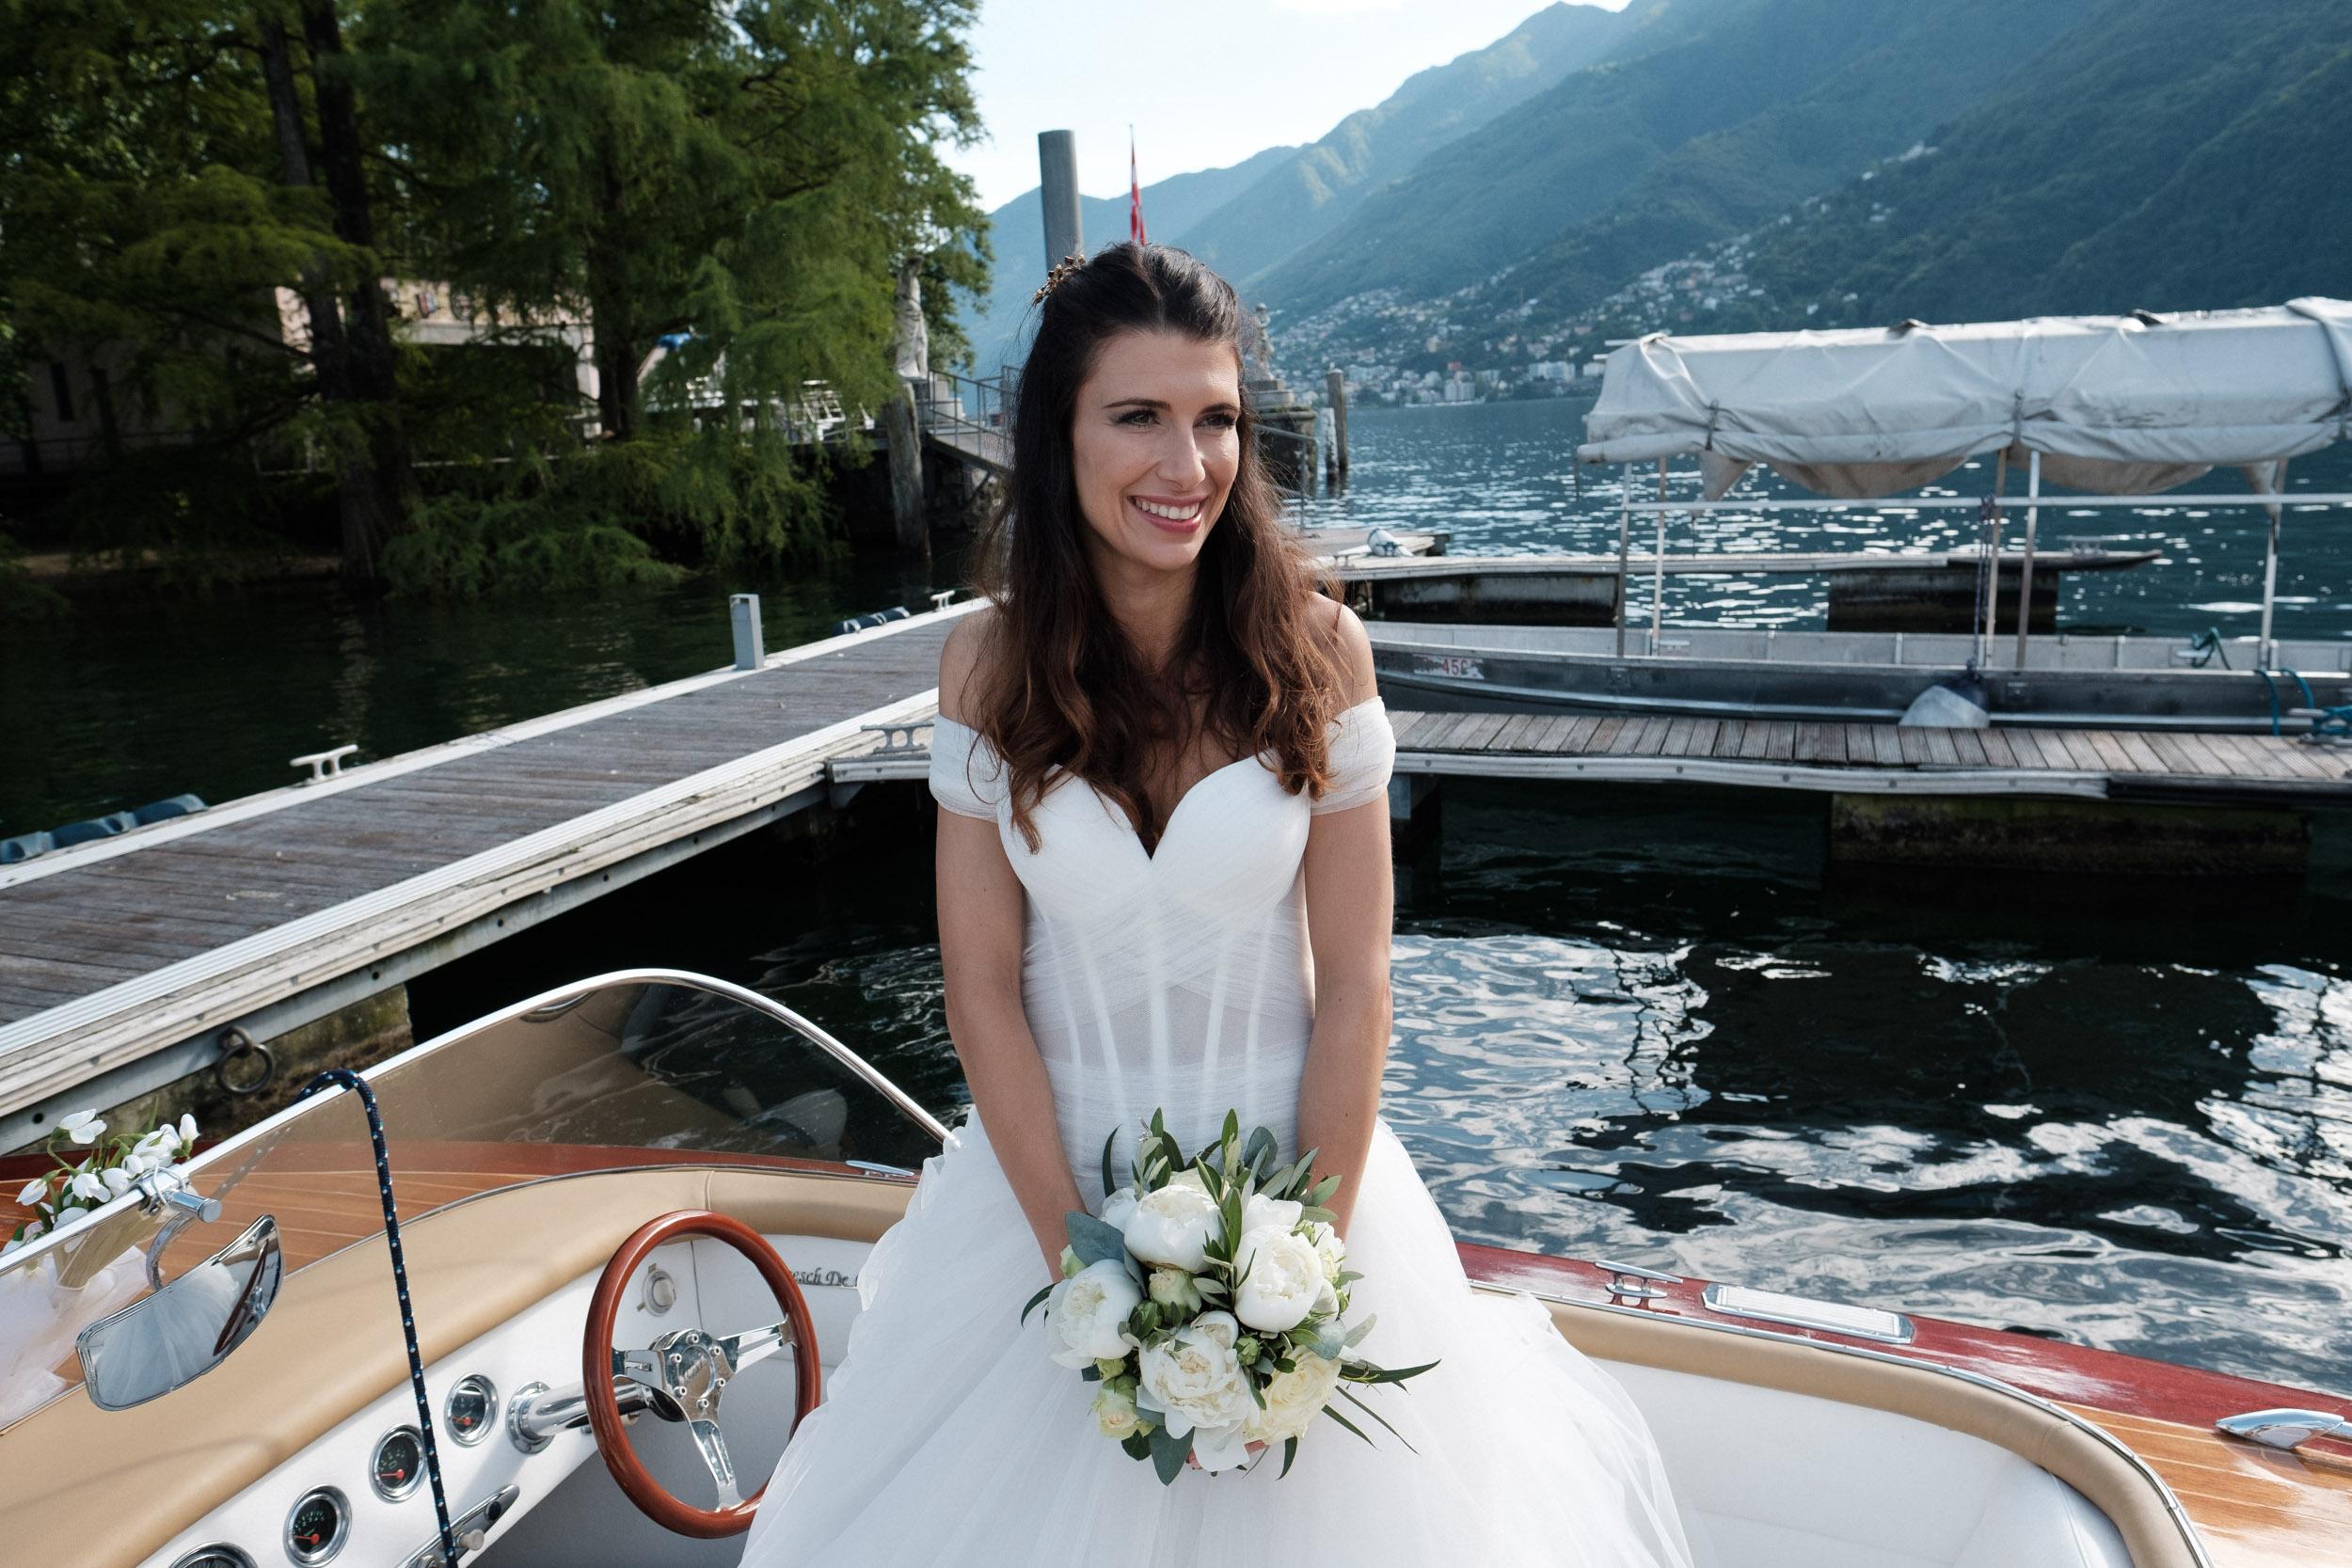 olivia-andreas-wedding-switzerland-415.jpg